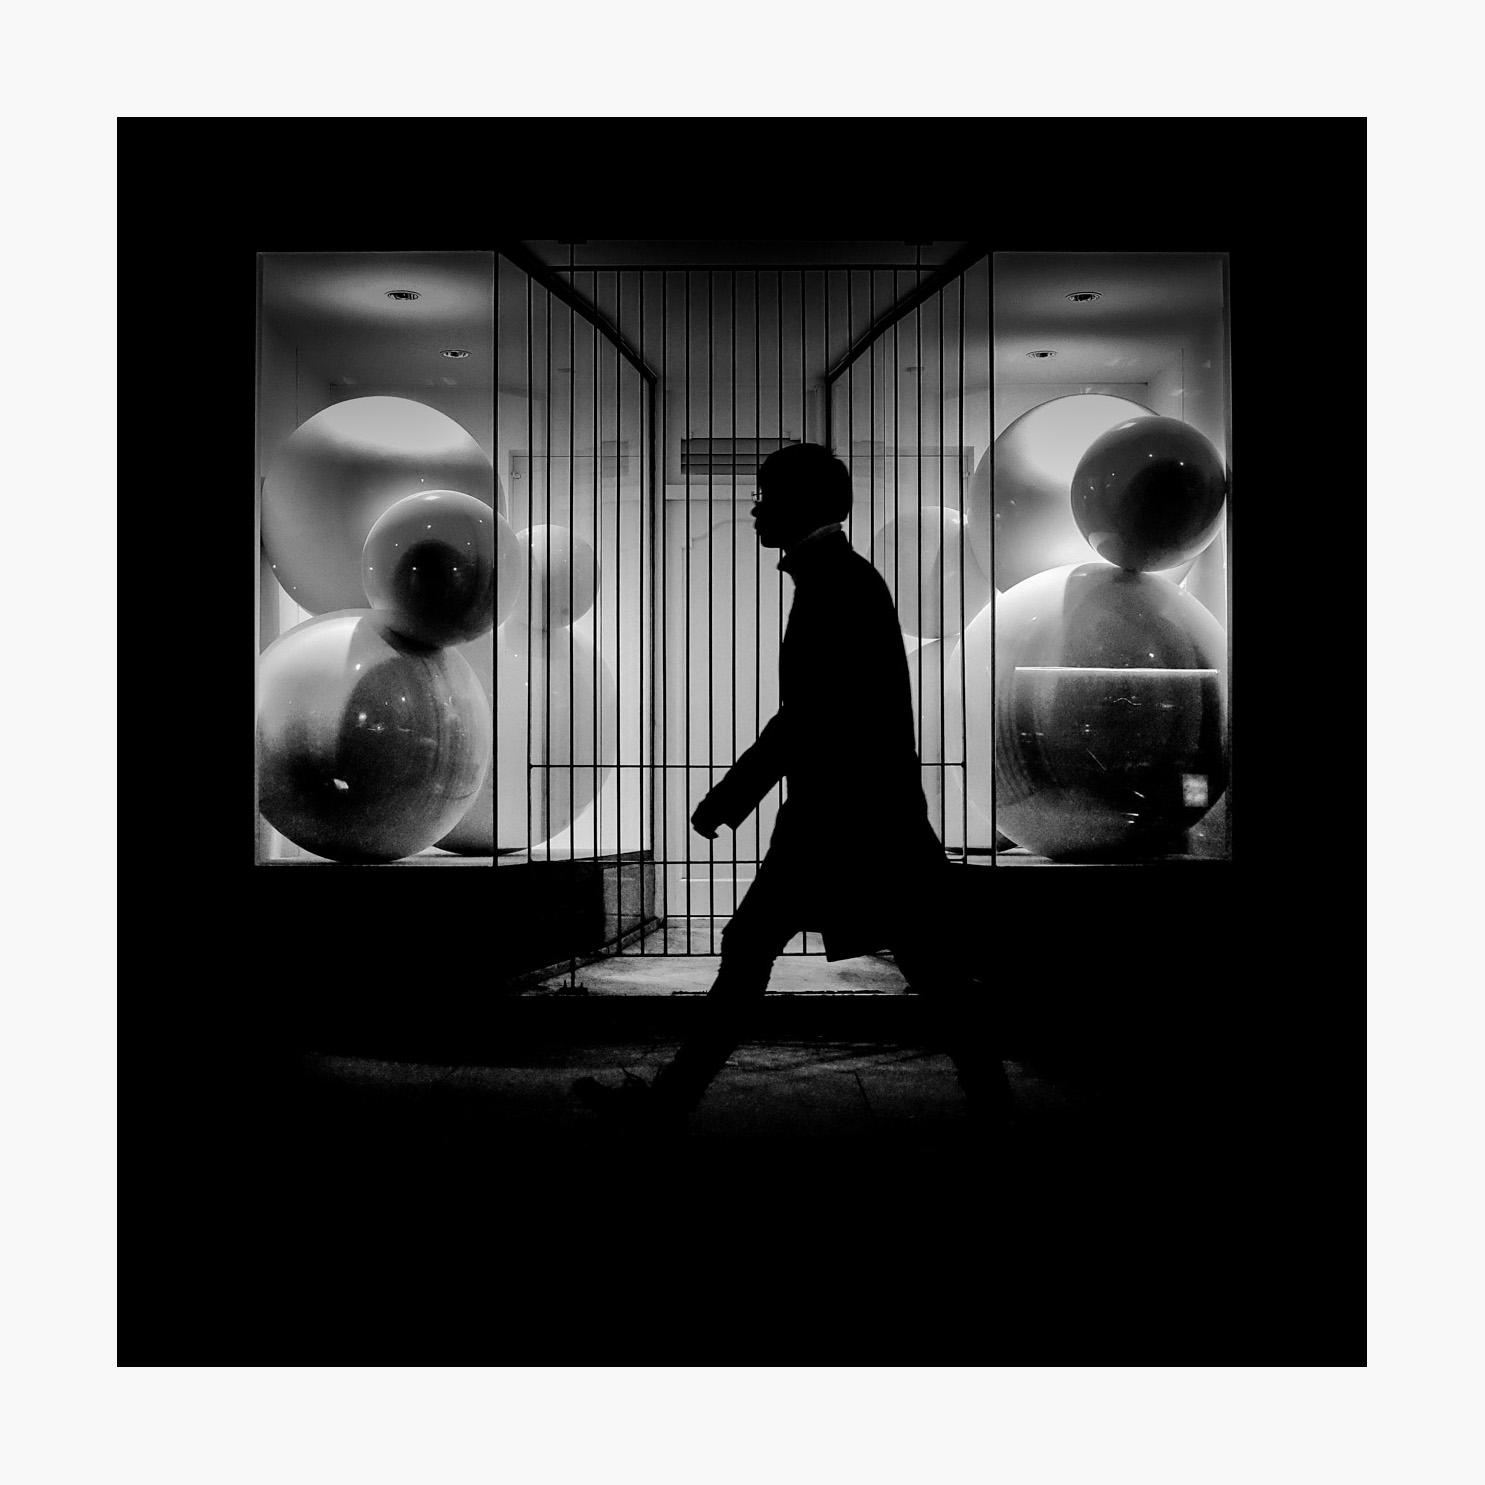 ©-Harry-W-Edmonds-2018-@photographersnote-Street-Sights-Social-PN04.jpg